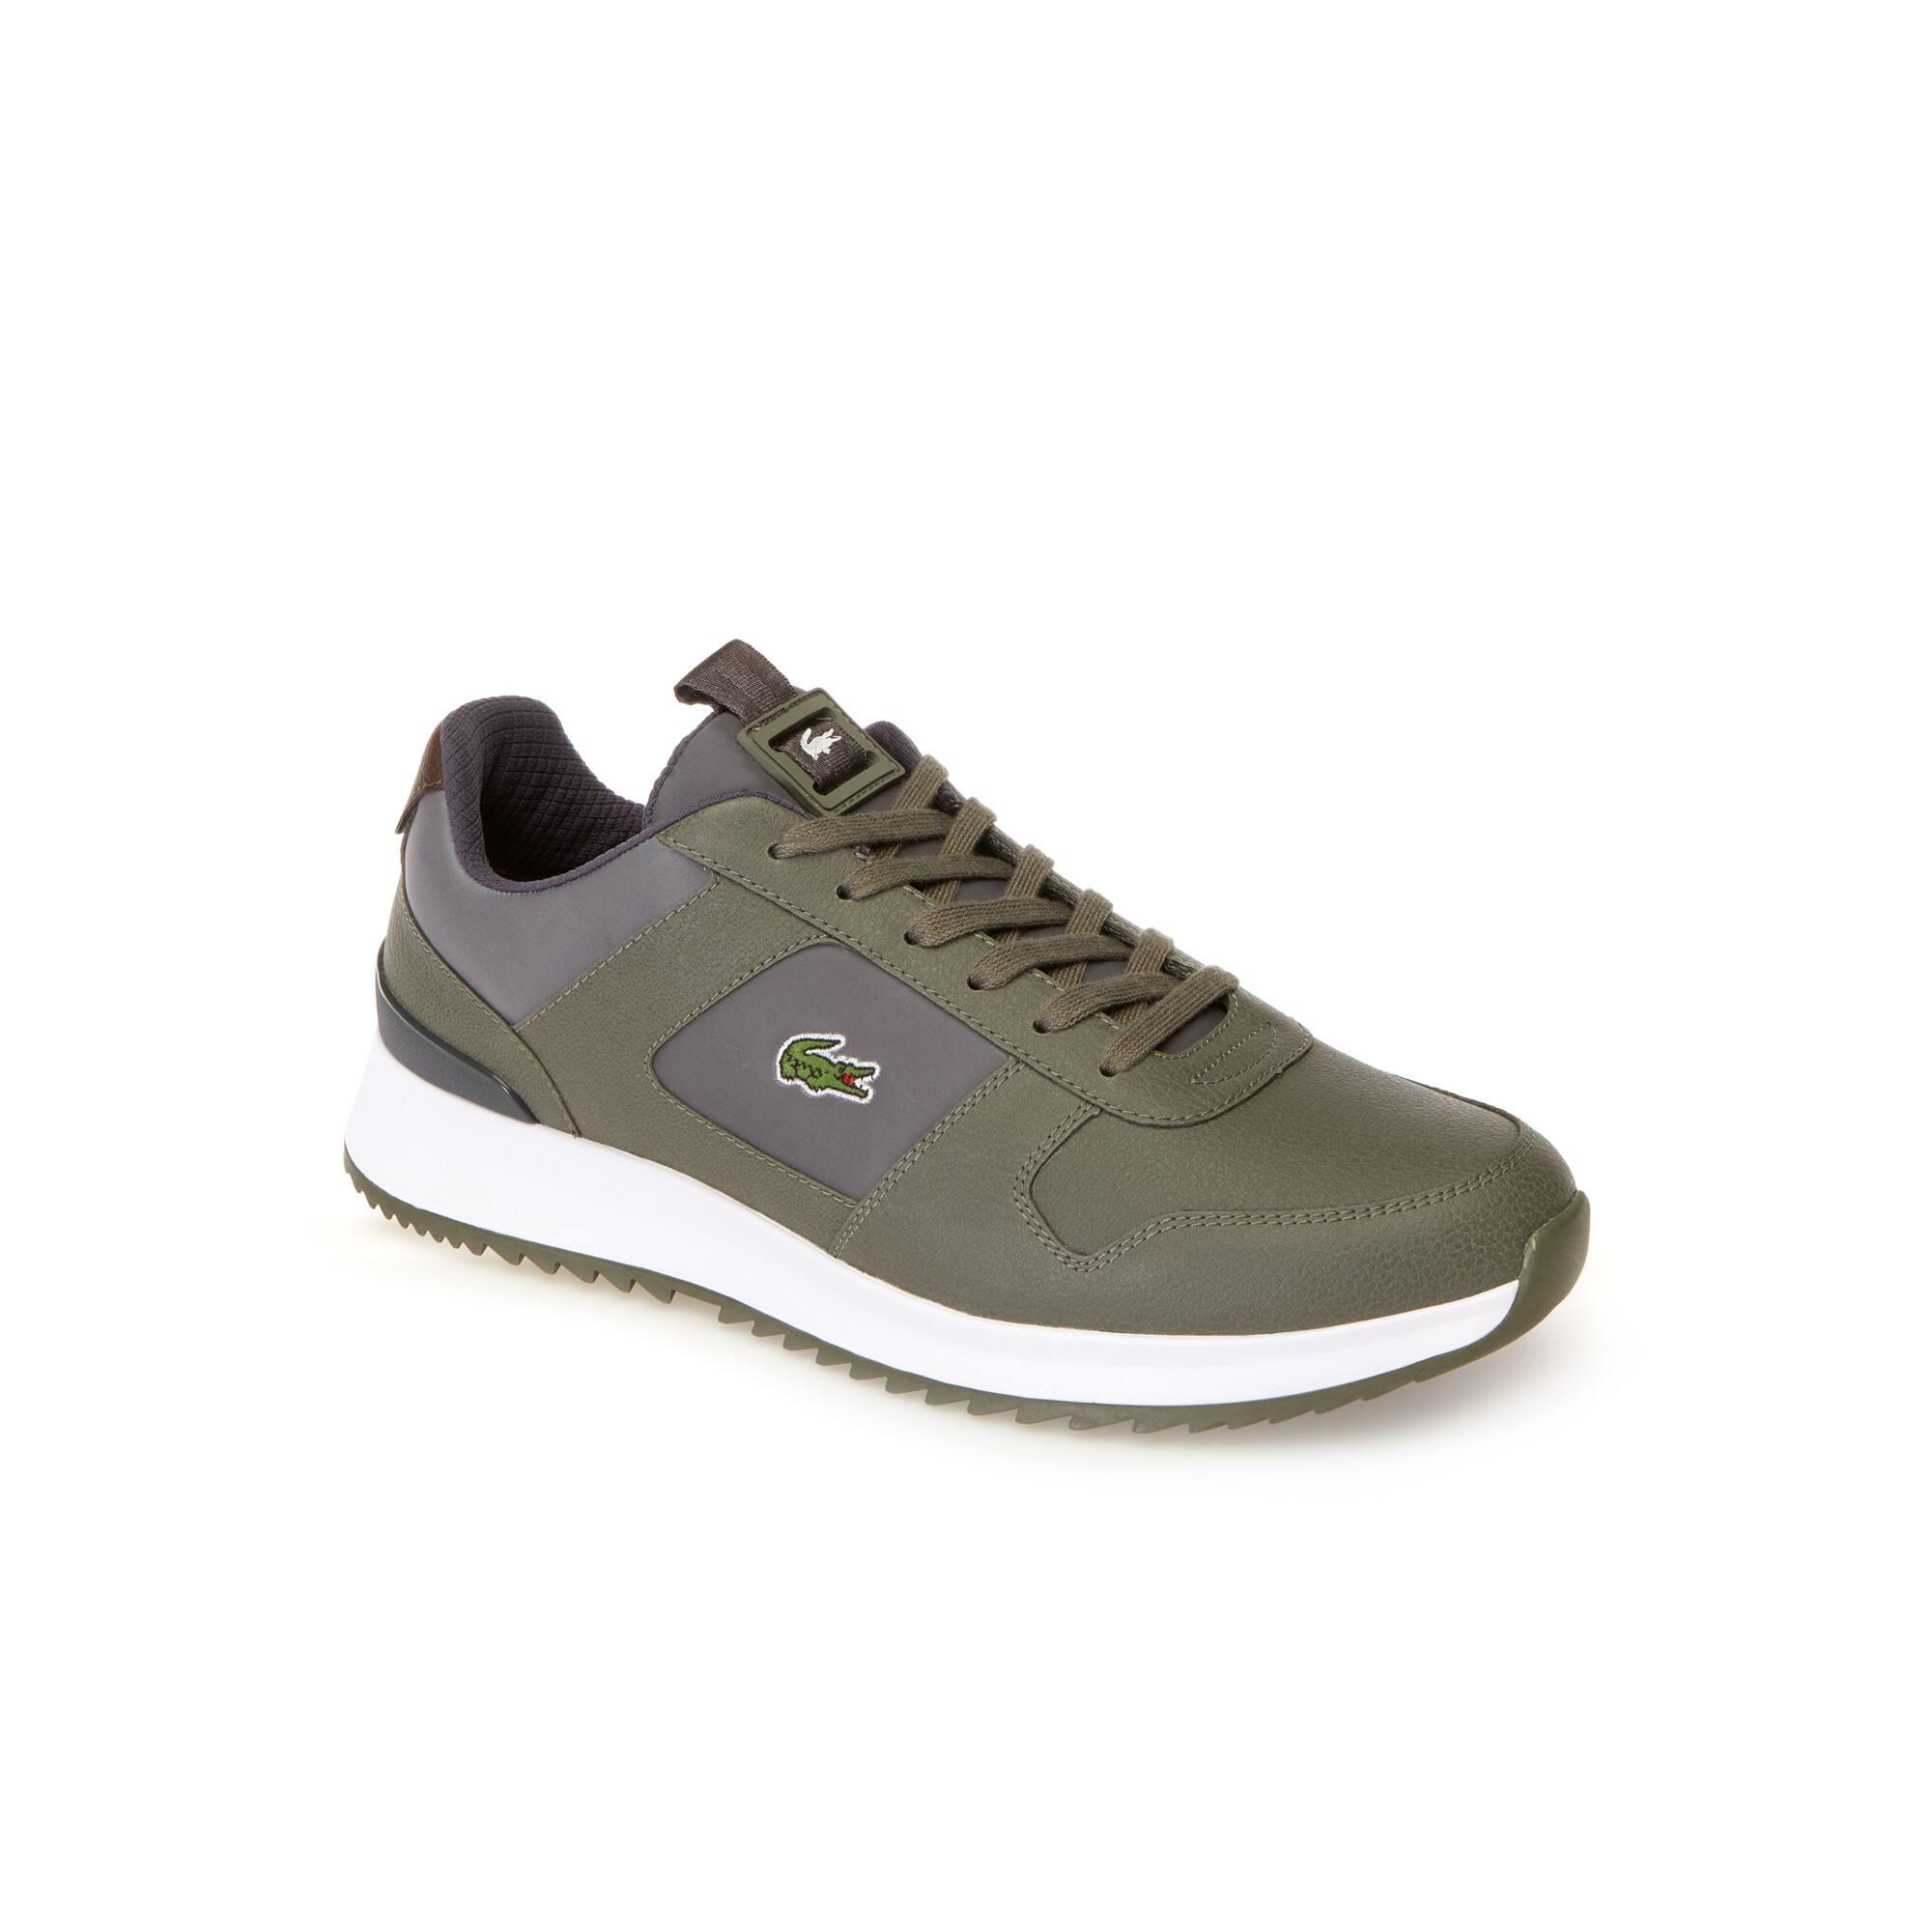 863ce9b2636a8 Calçados masculinos Lacoste  Sneakers